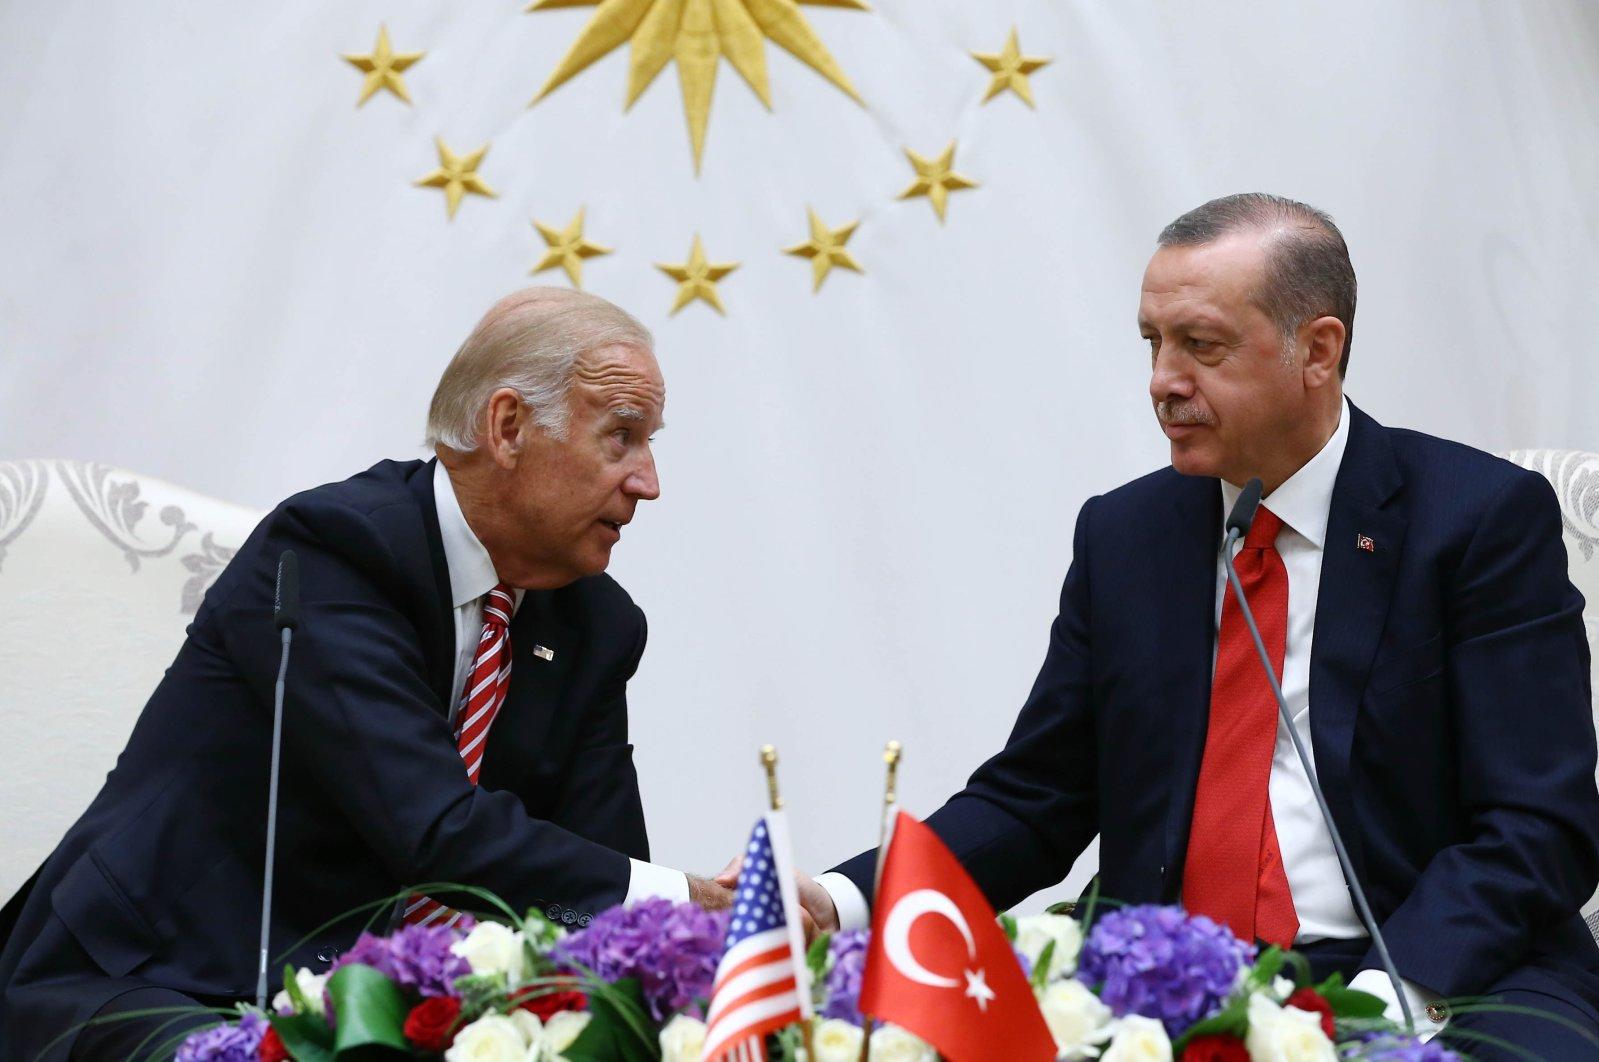 Former U.S. Vice President Joe Biden (L) talks with President Recep Tayyip Erdogan during a meeting in Ankara, Turkey, Aug. 24, 2016. (AP Photo)